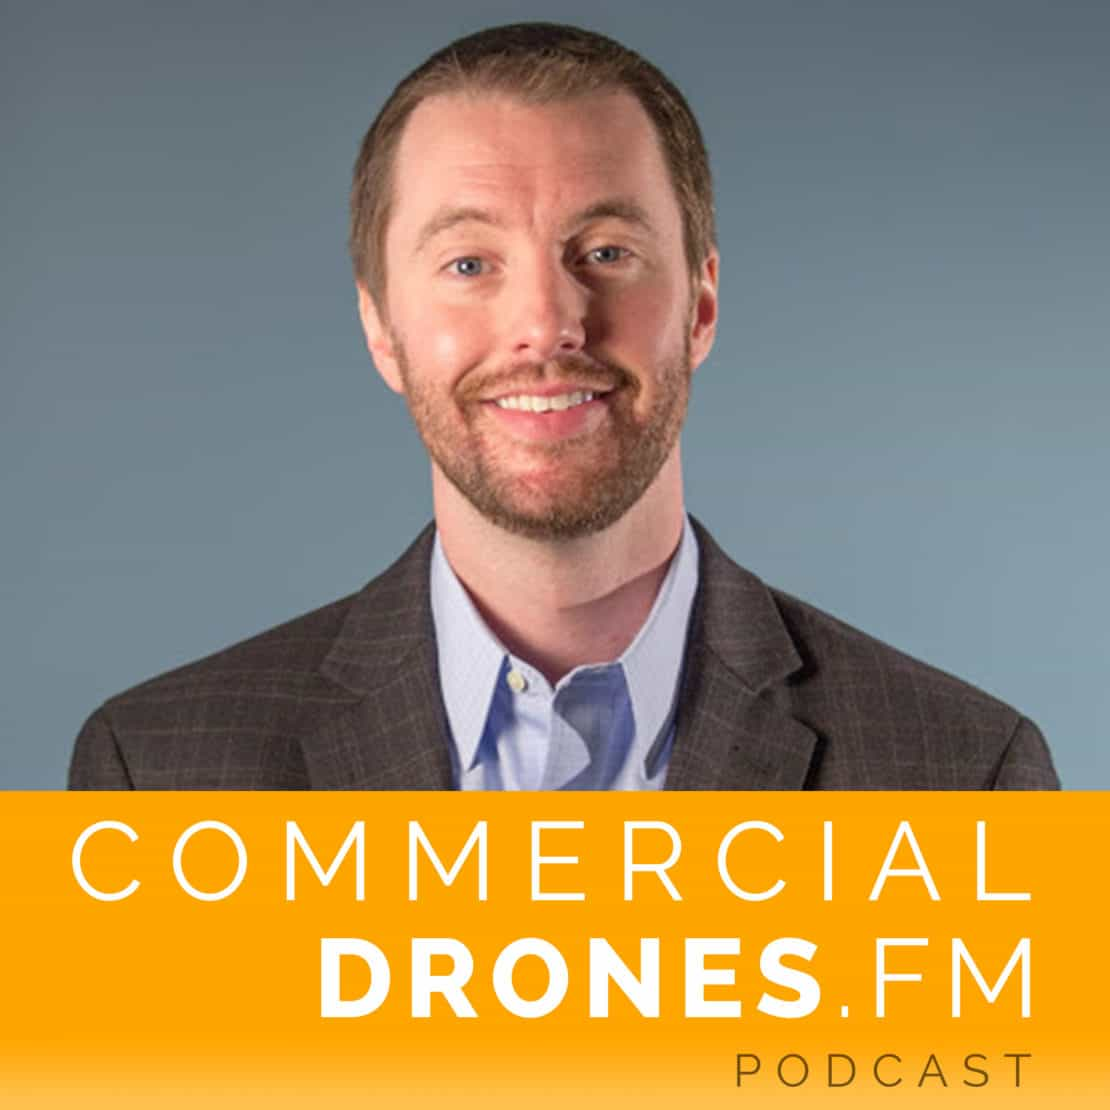 Commercial Drones FM Podcast - Thomas Haun - PrecisionHawk